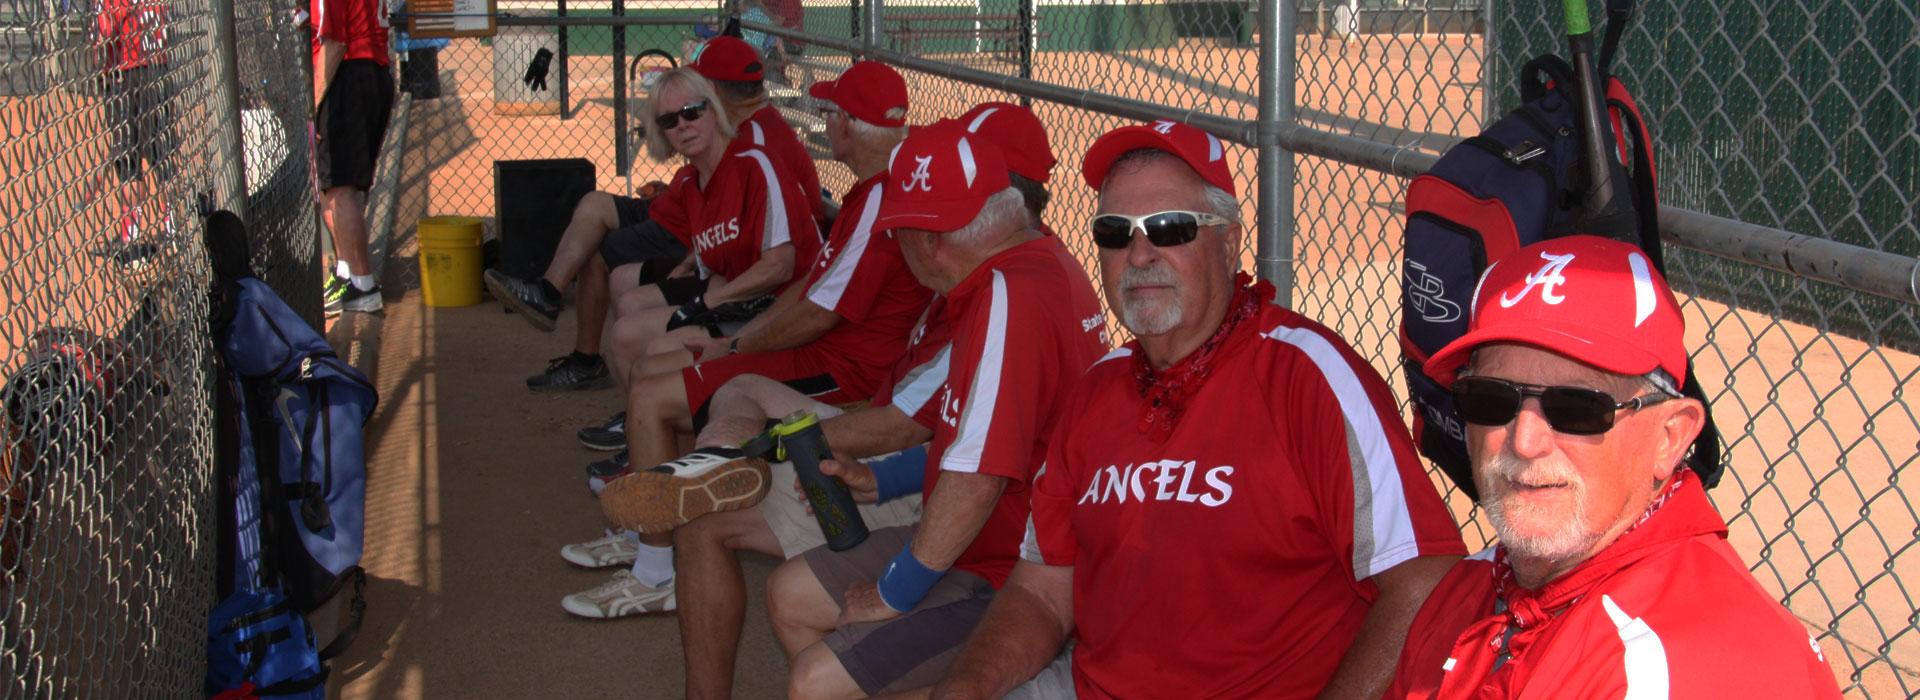 Welcome To The Metroplex Senior Citizens Softball Association!